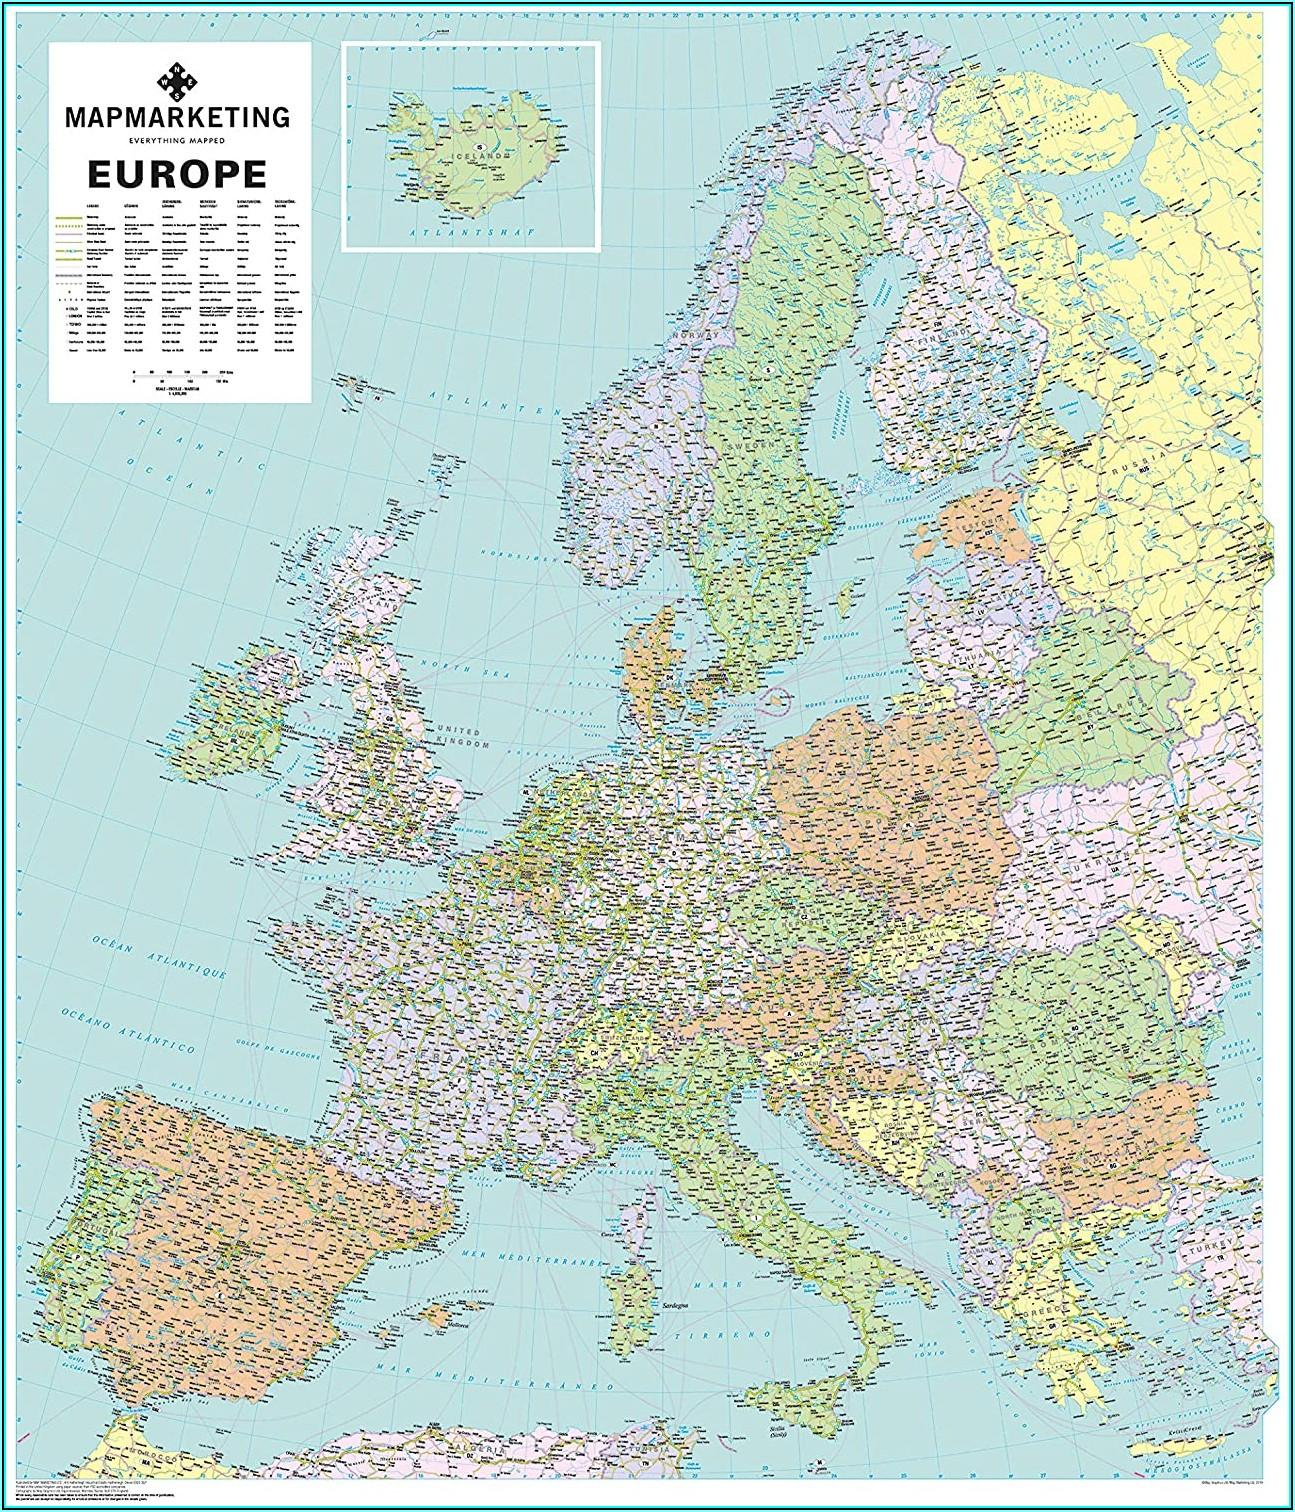 Laminated Wall Map Of Europe